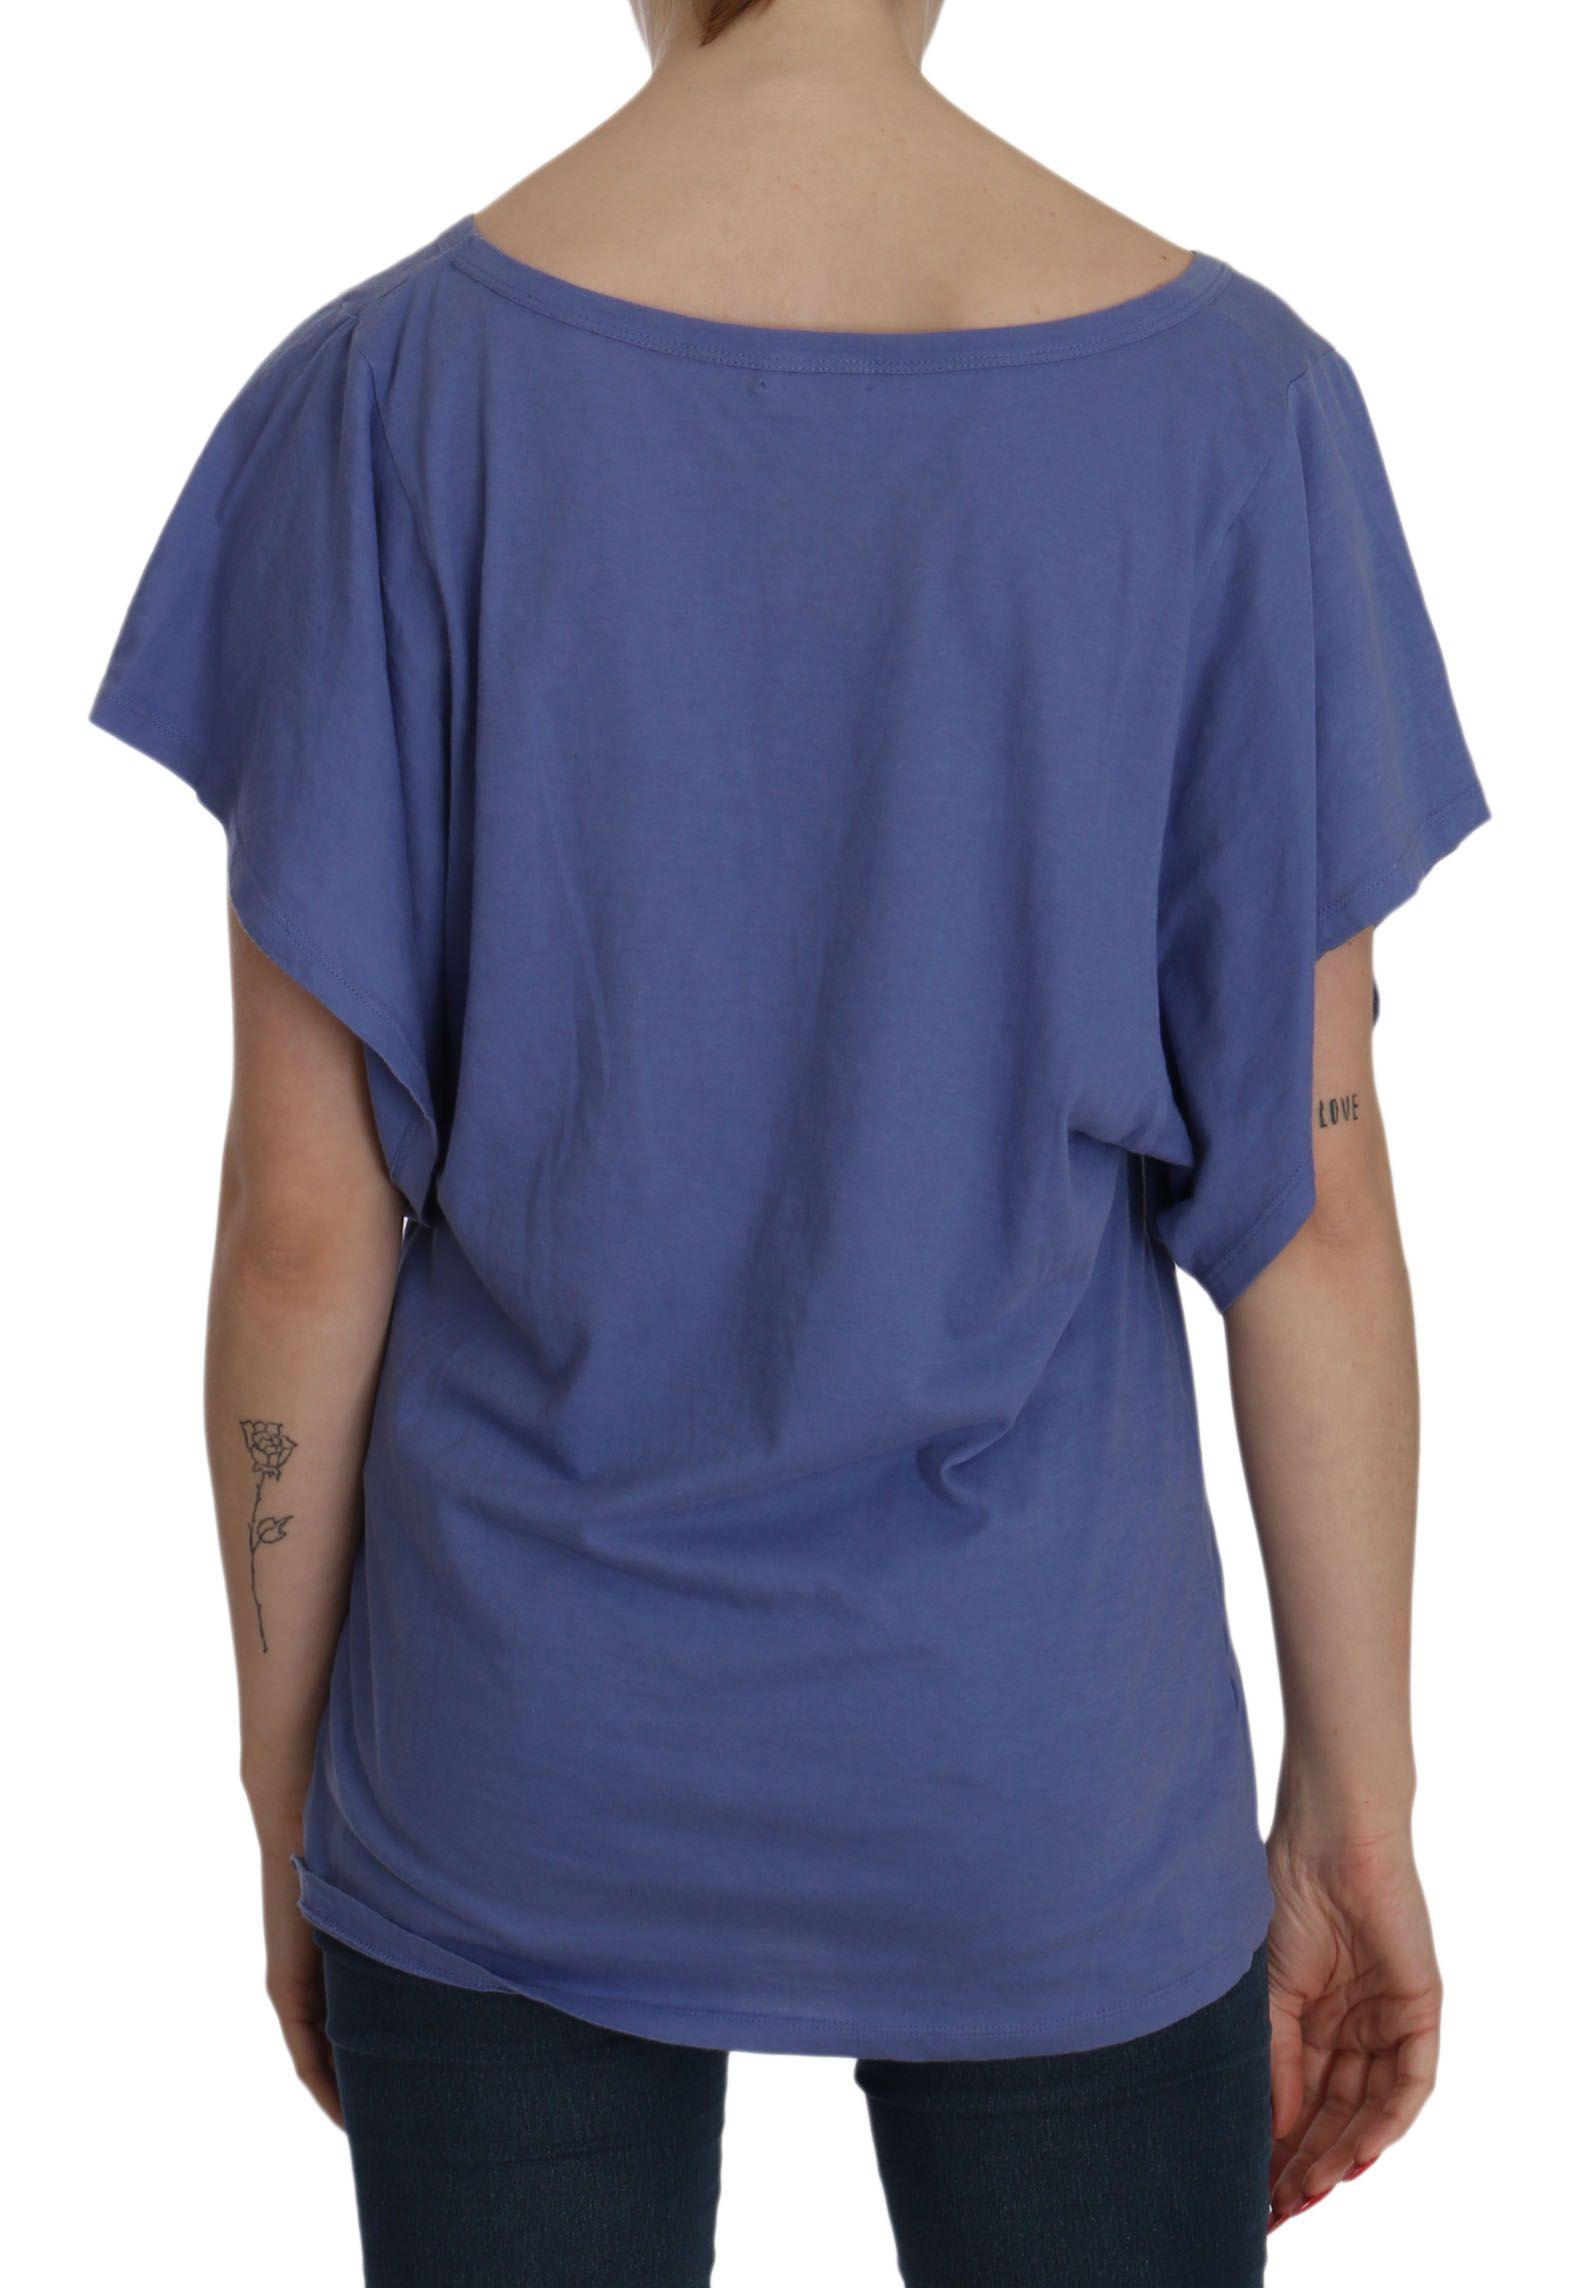 Galliano Blue Short Sleeve Round Neck Shirt Cotton Blouse